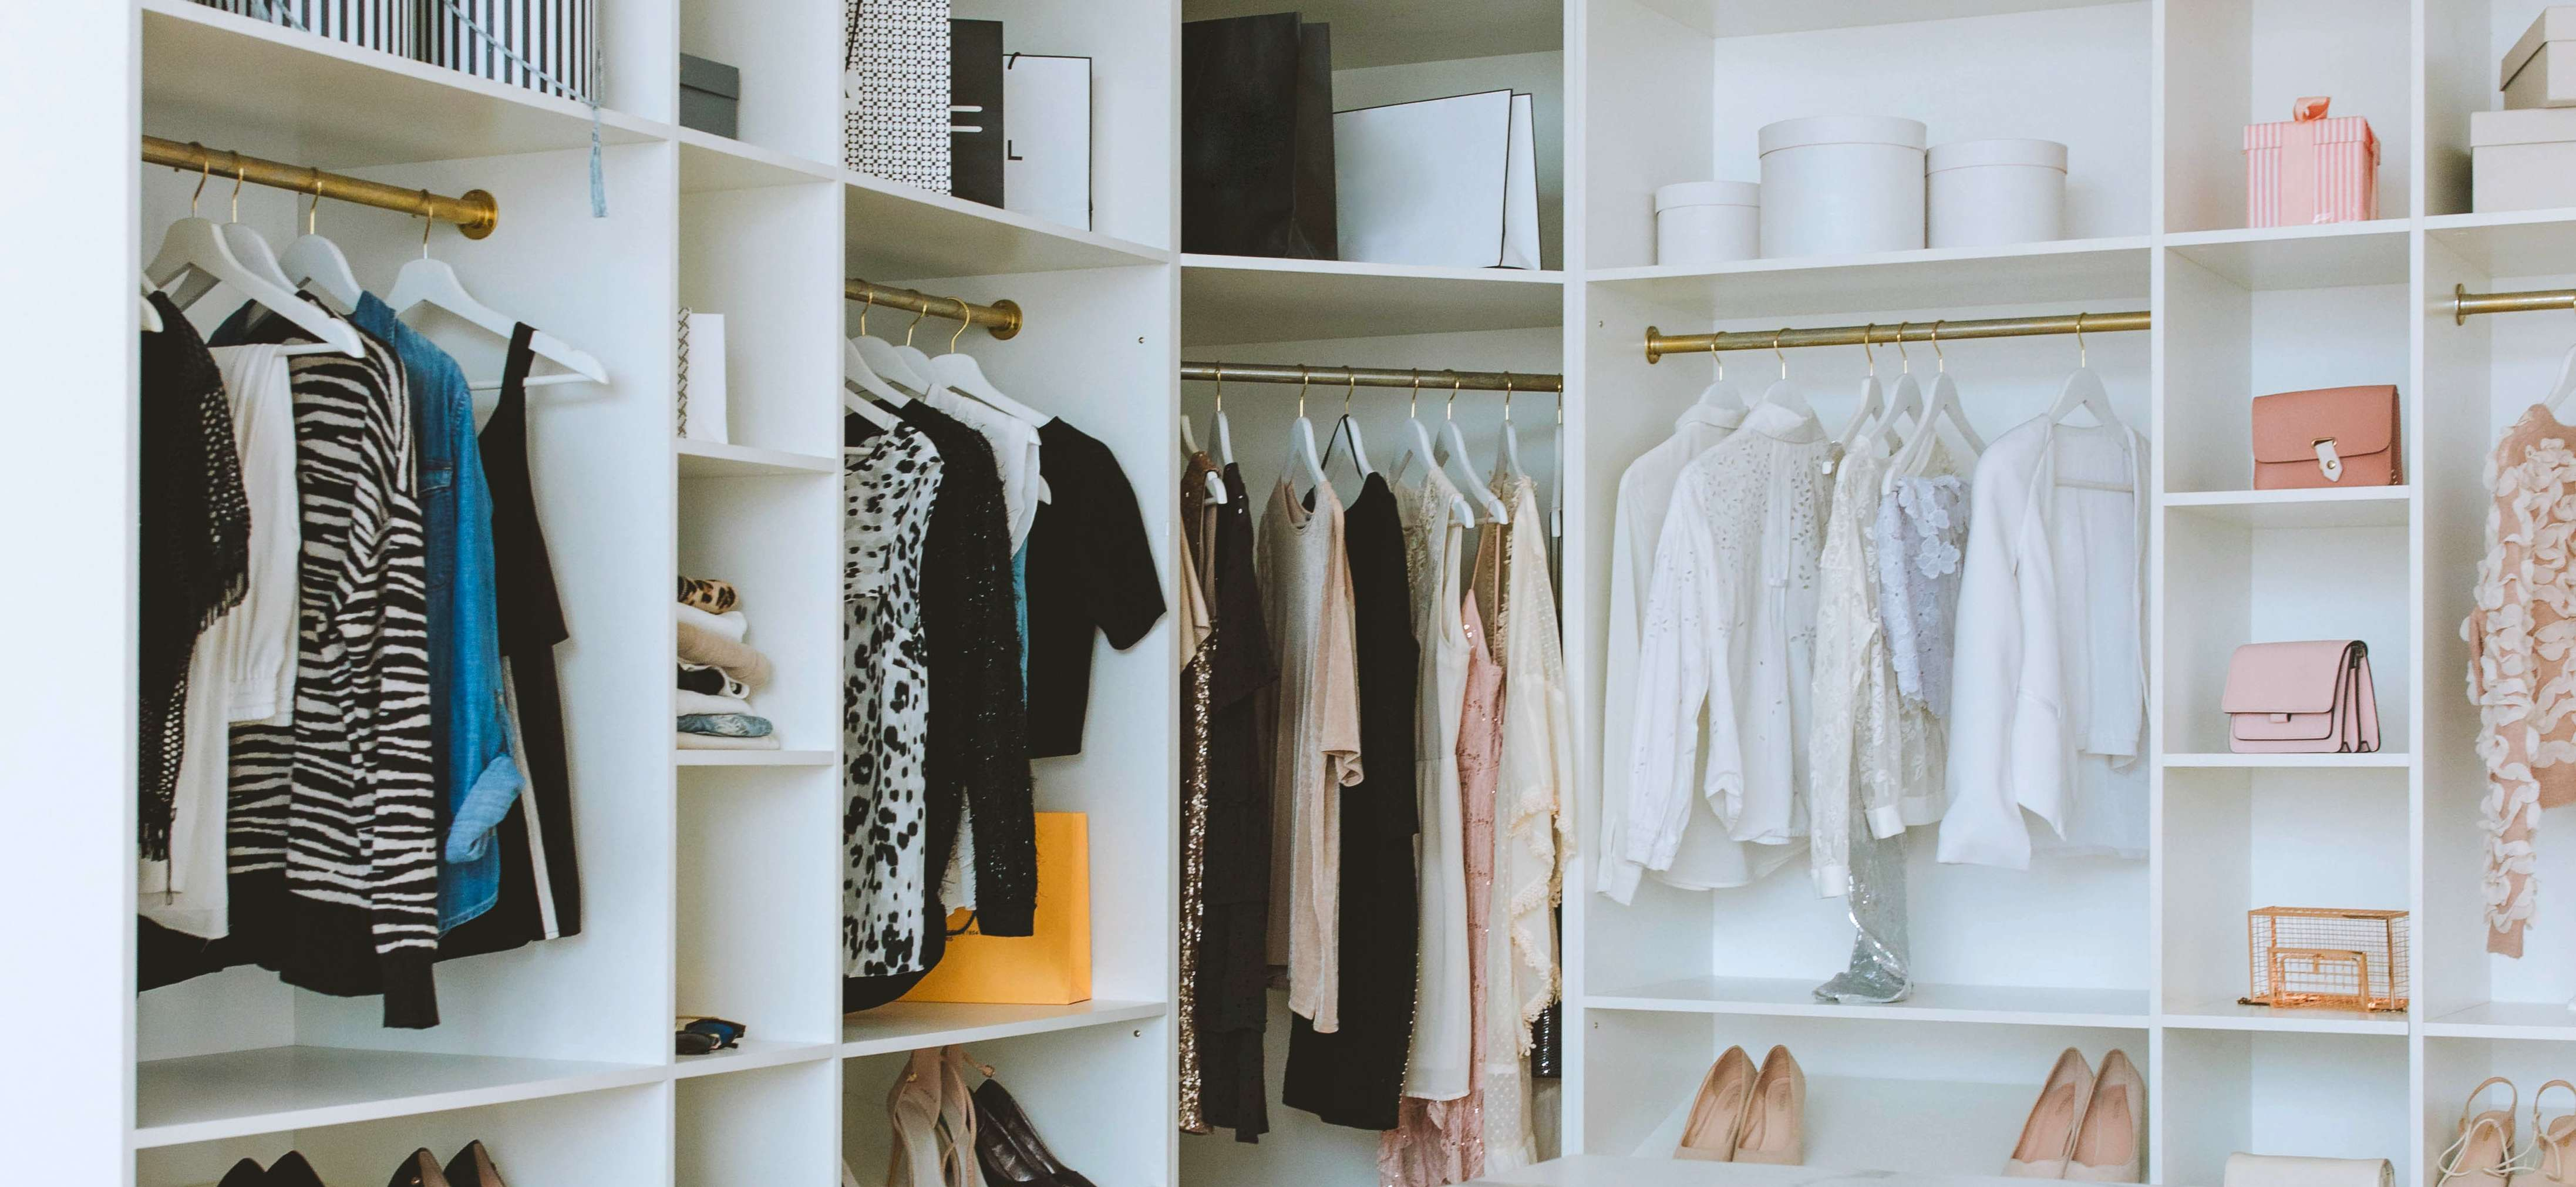 Aménagement dressing et meuble